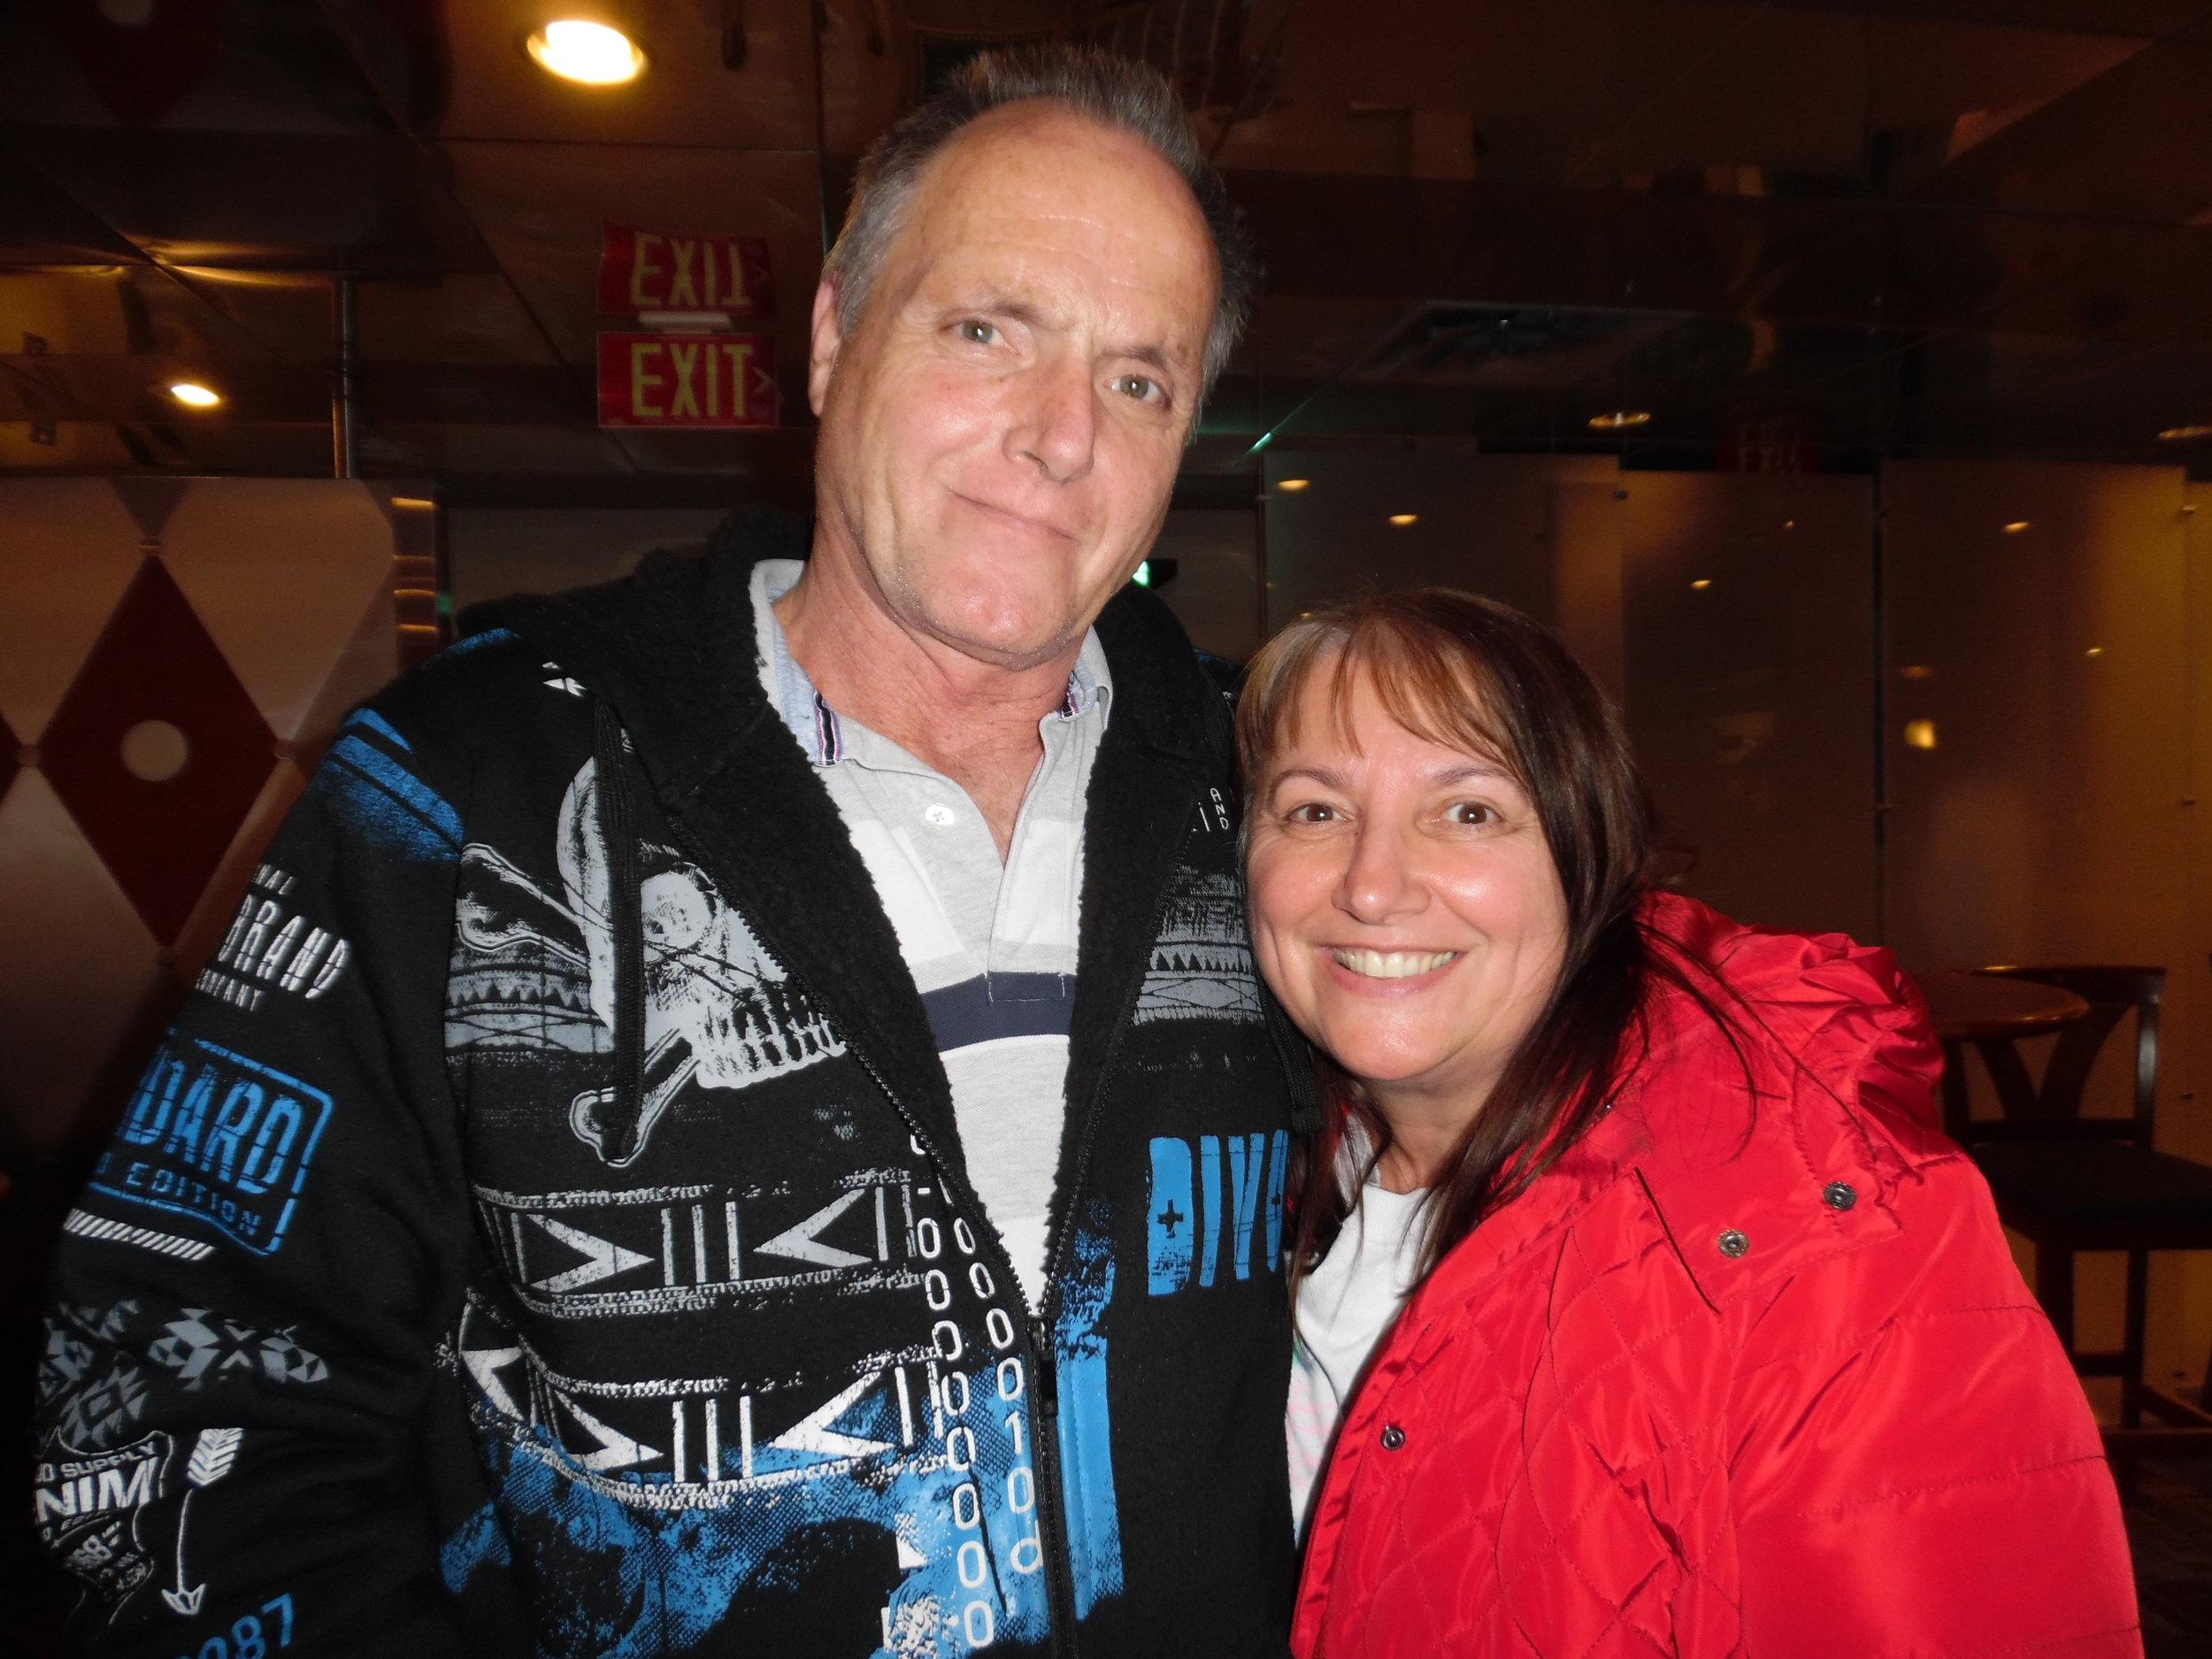 Friends Brian and Debbie at Mohawk Raceway after ETA  Matt Cage 's show.